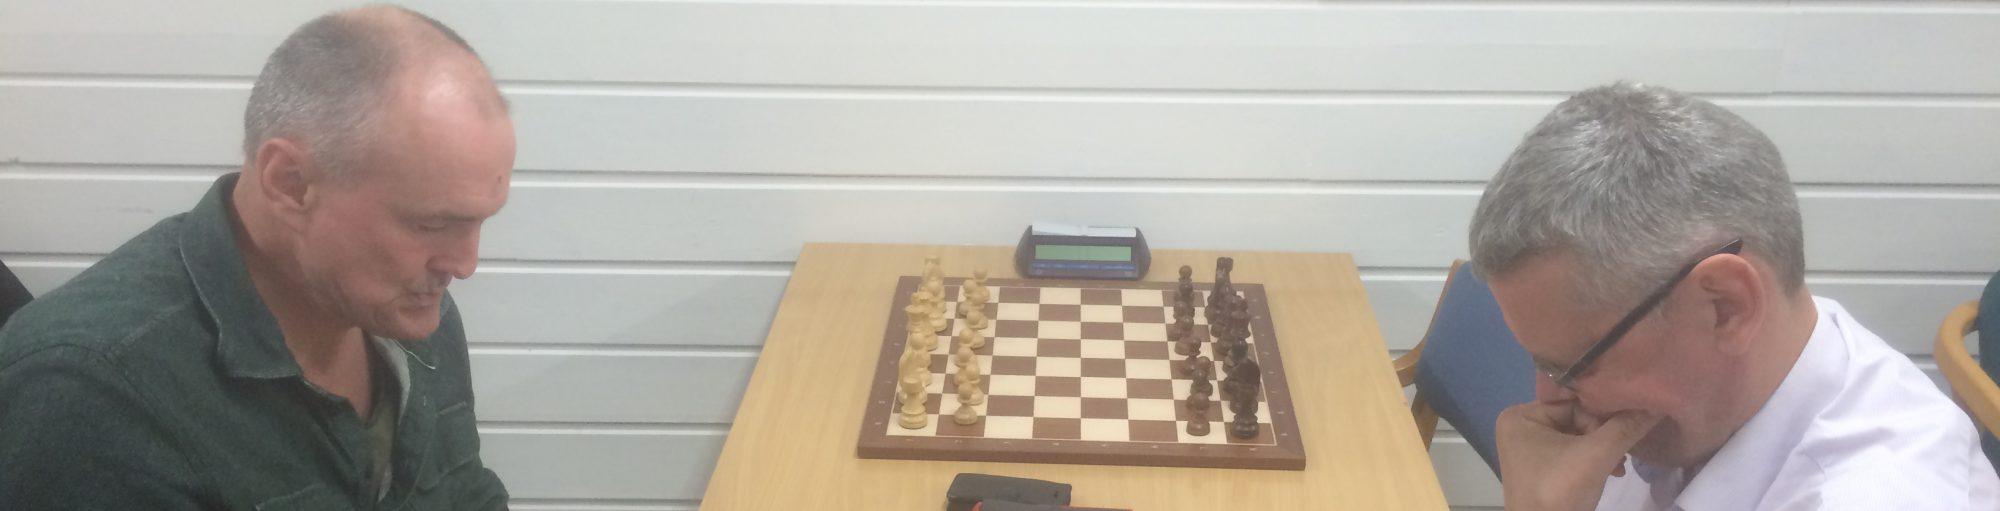 Konnerud Sjakklubb